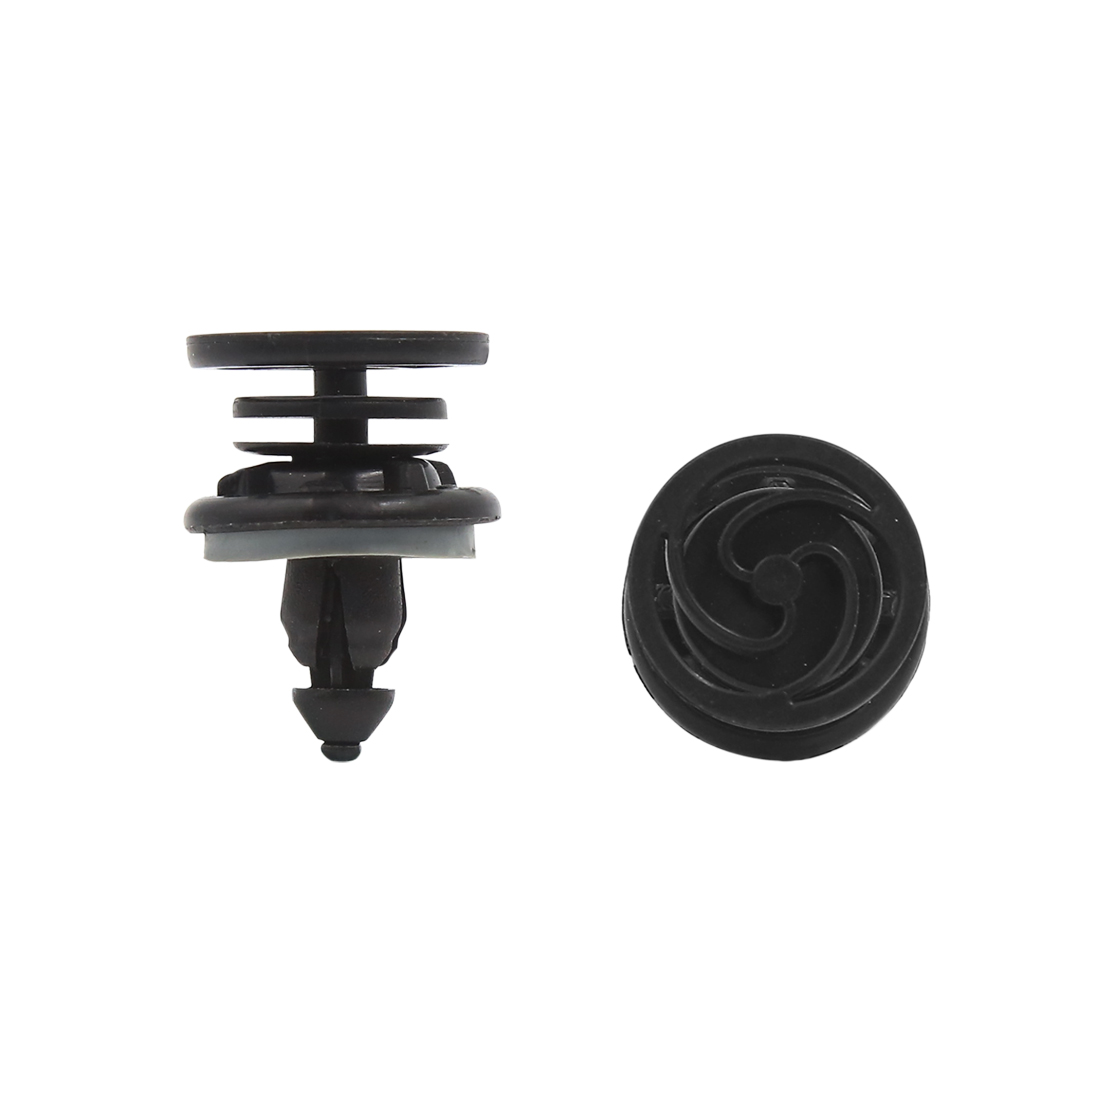 Car Plastic Rivet Bumper Fender Fastener Retainer Clip Black 8mm Hole 50pcs